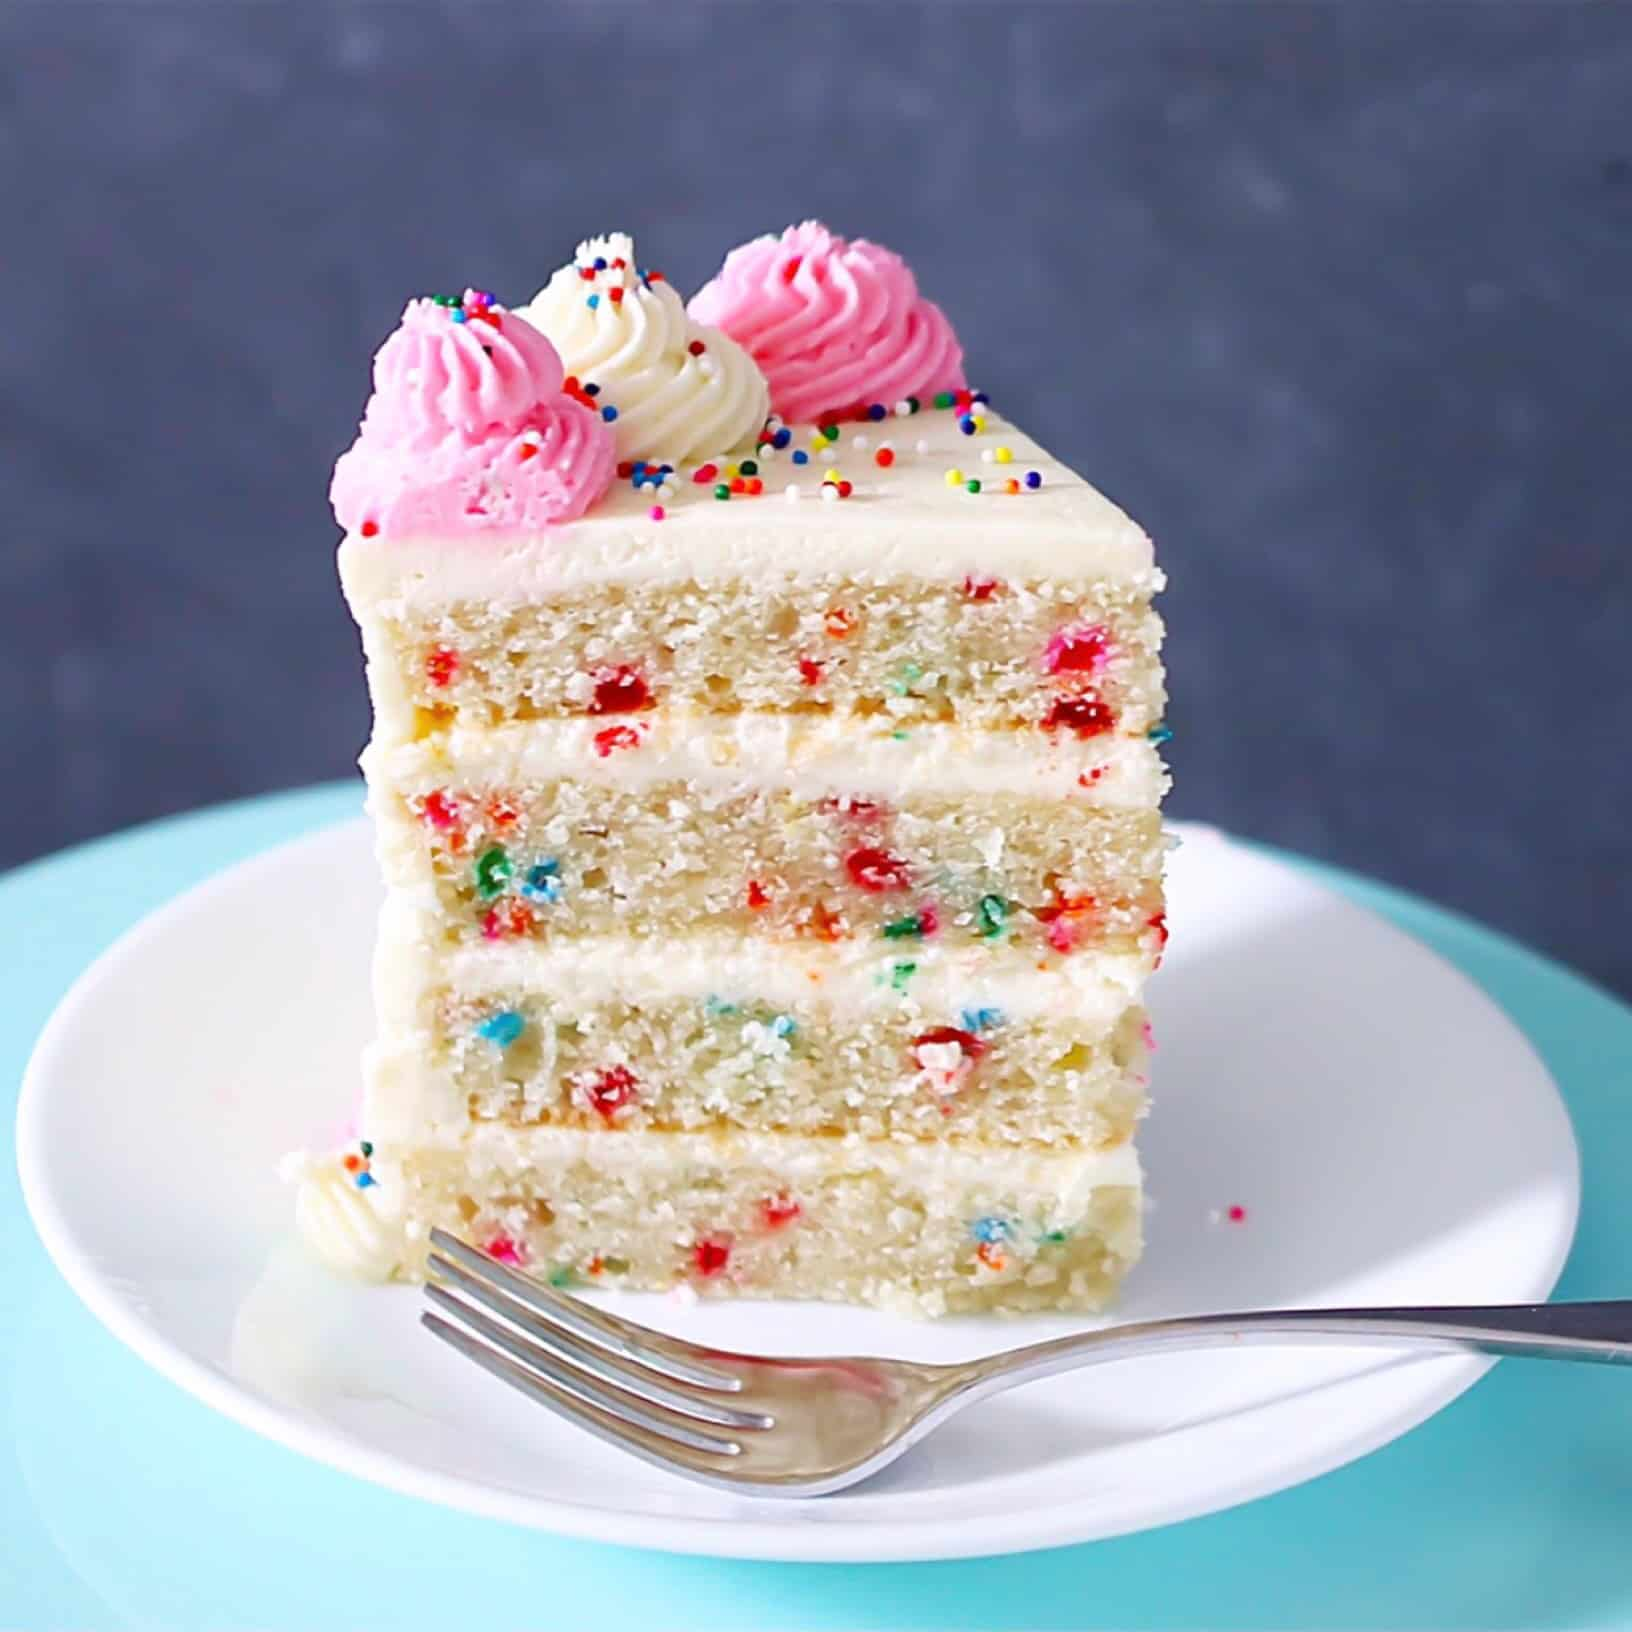 cake 2 new